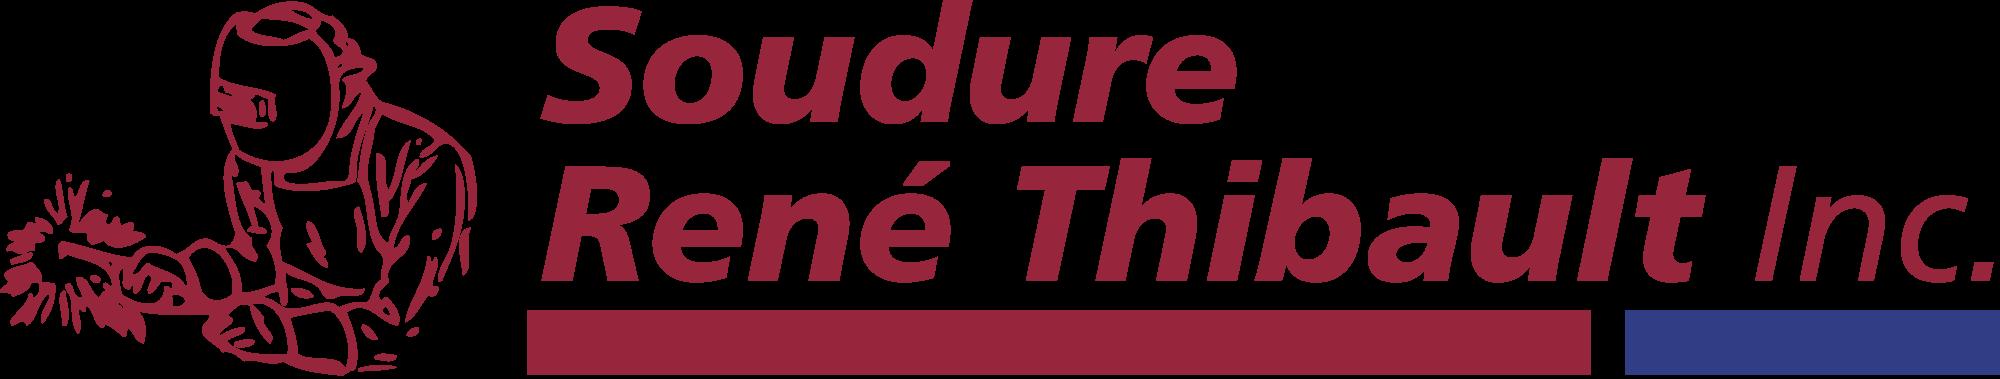 logo-Soudure-Rene-Thibault